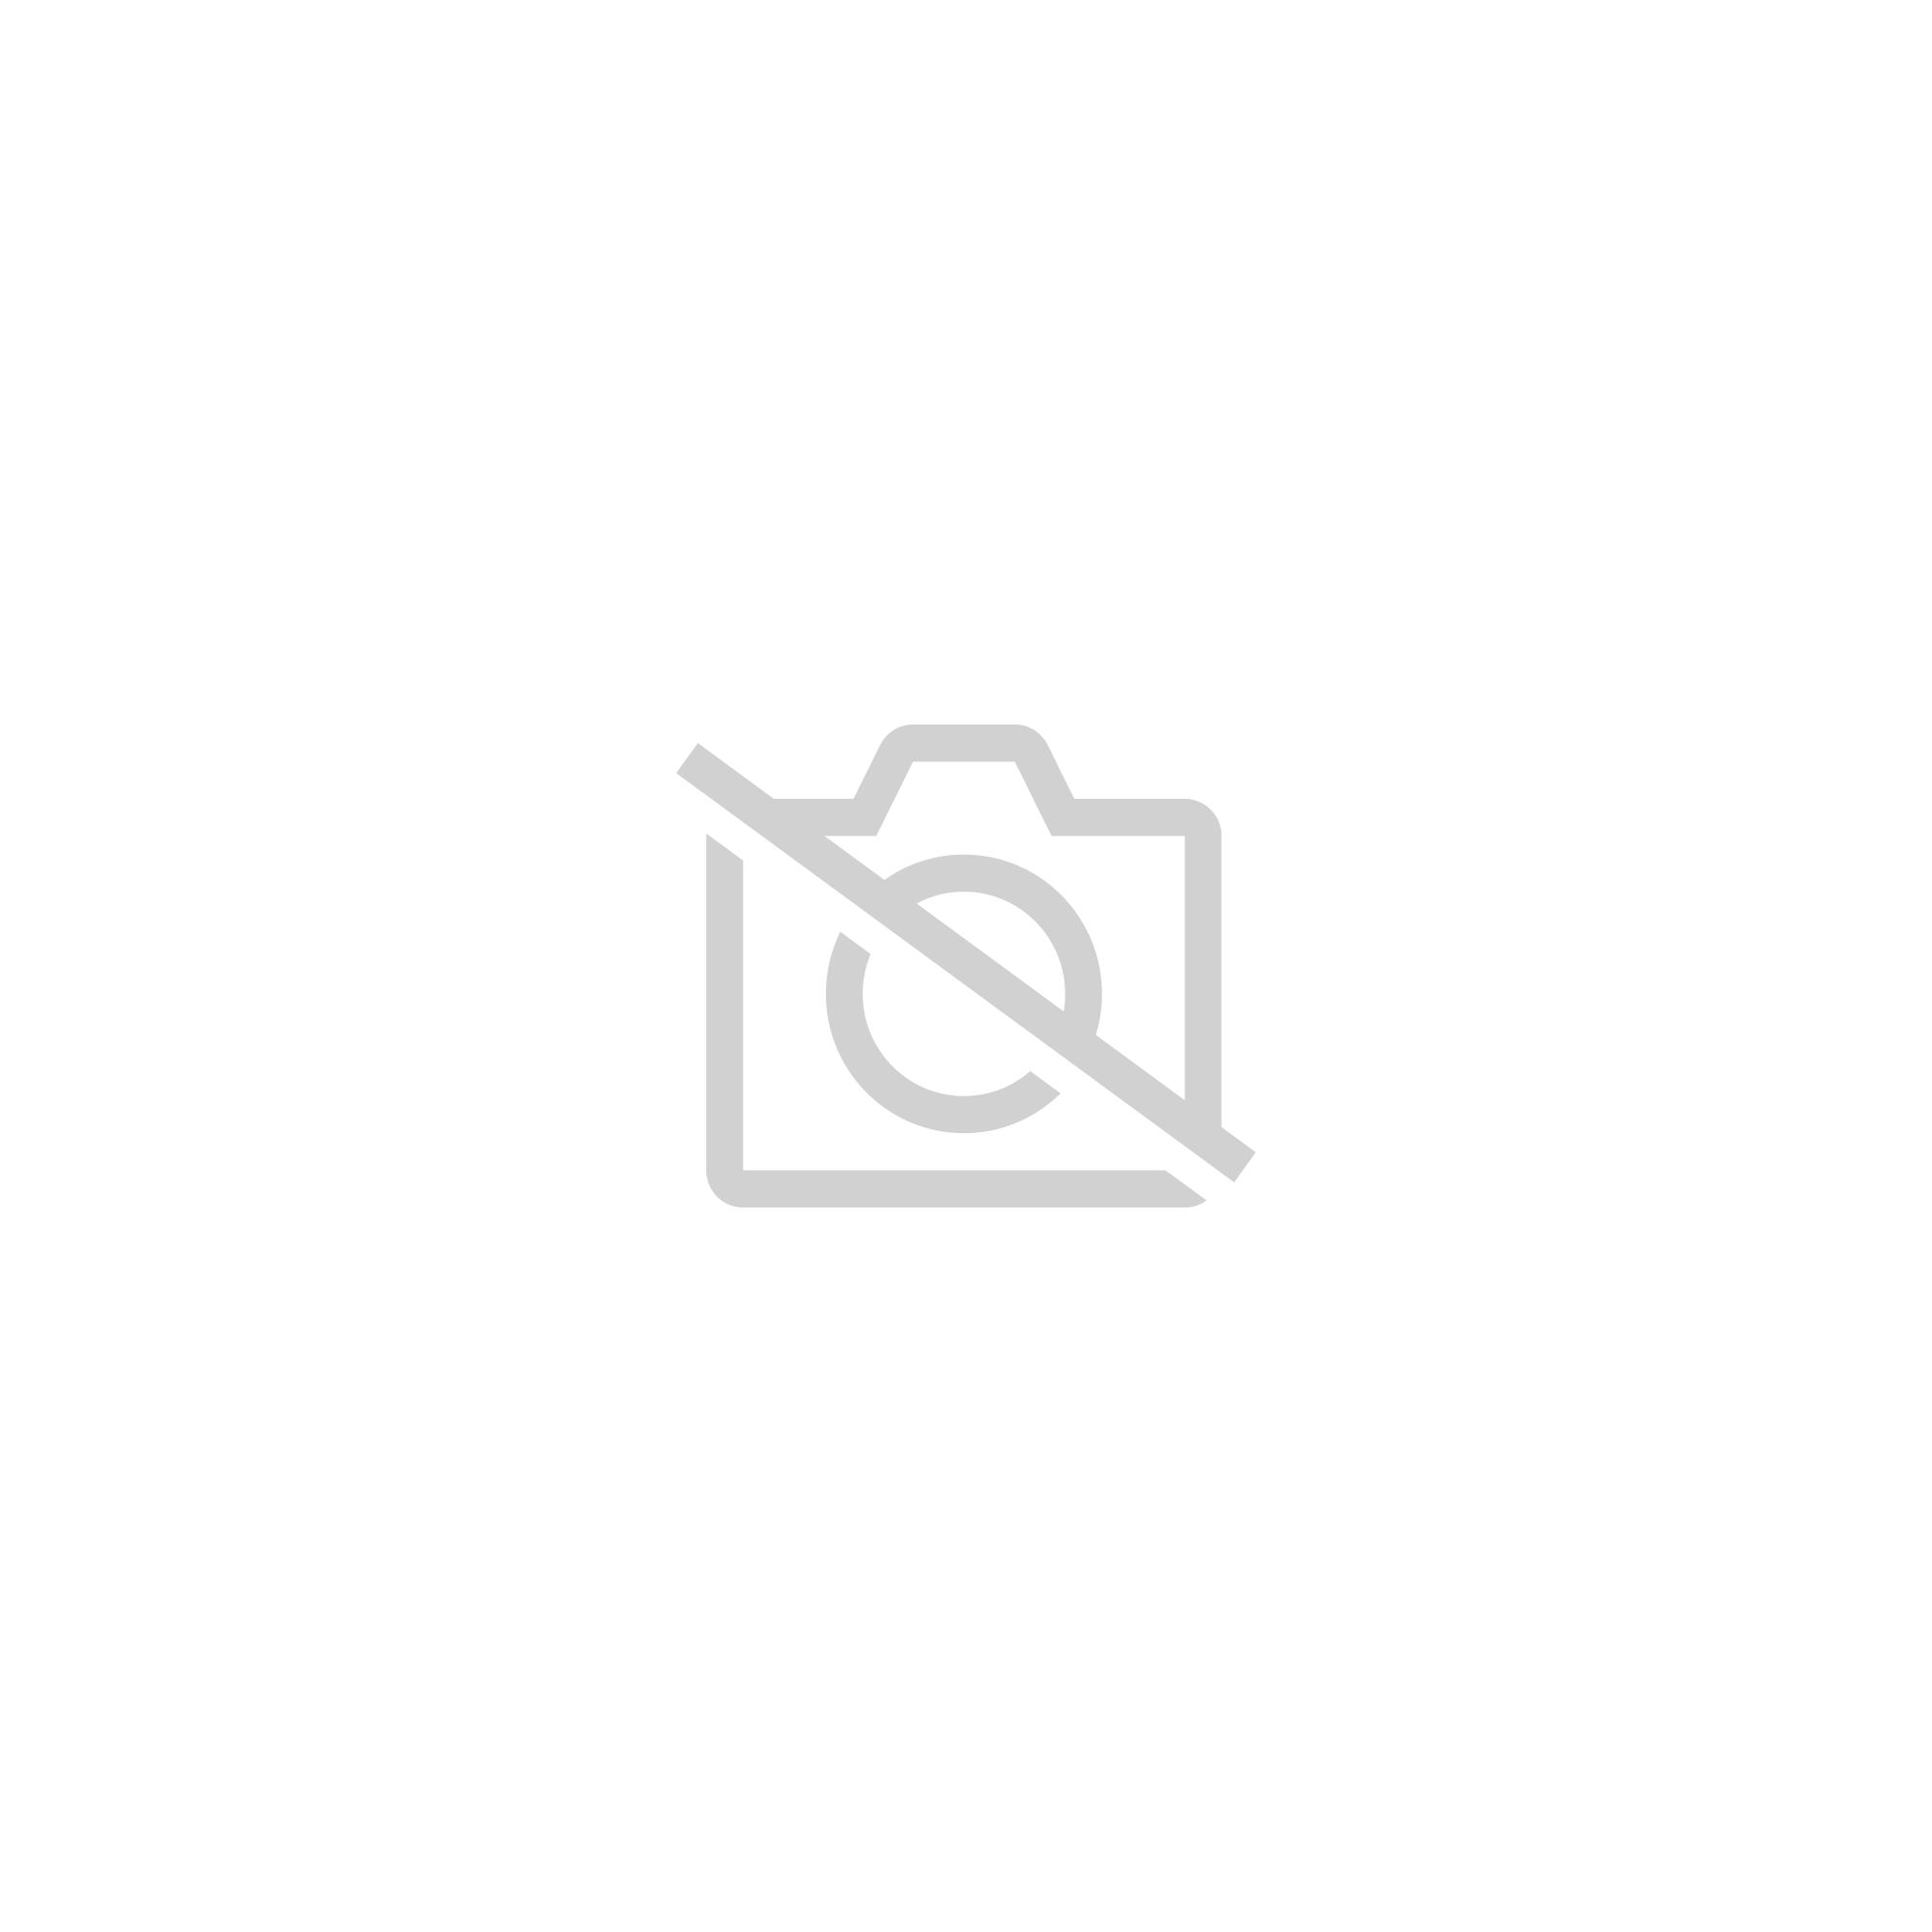 Plugins Vst / Vsti Effets & Synthétiseurs